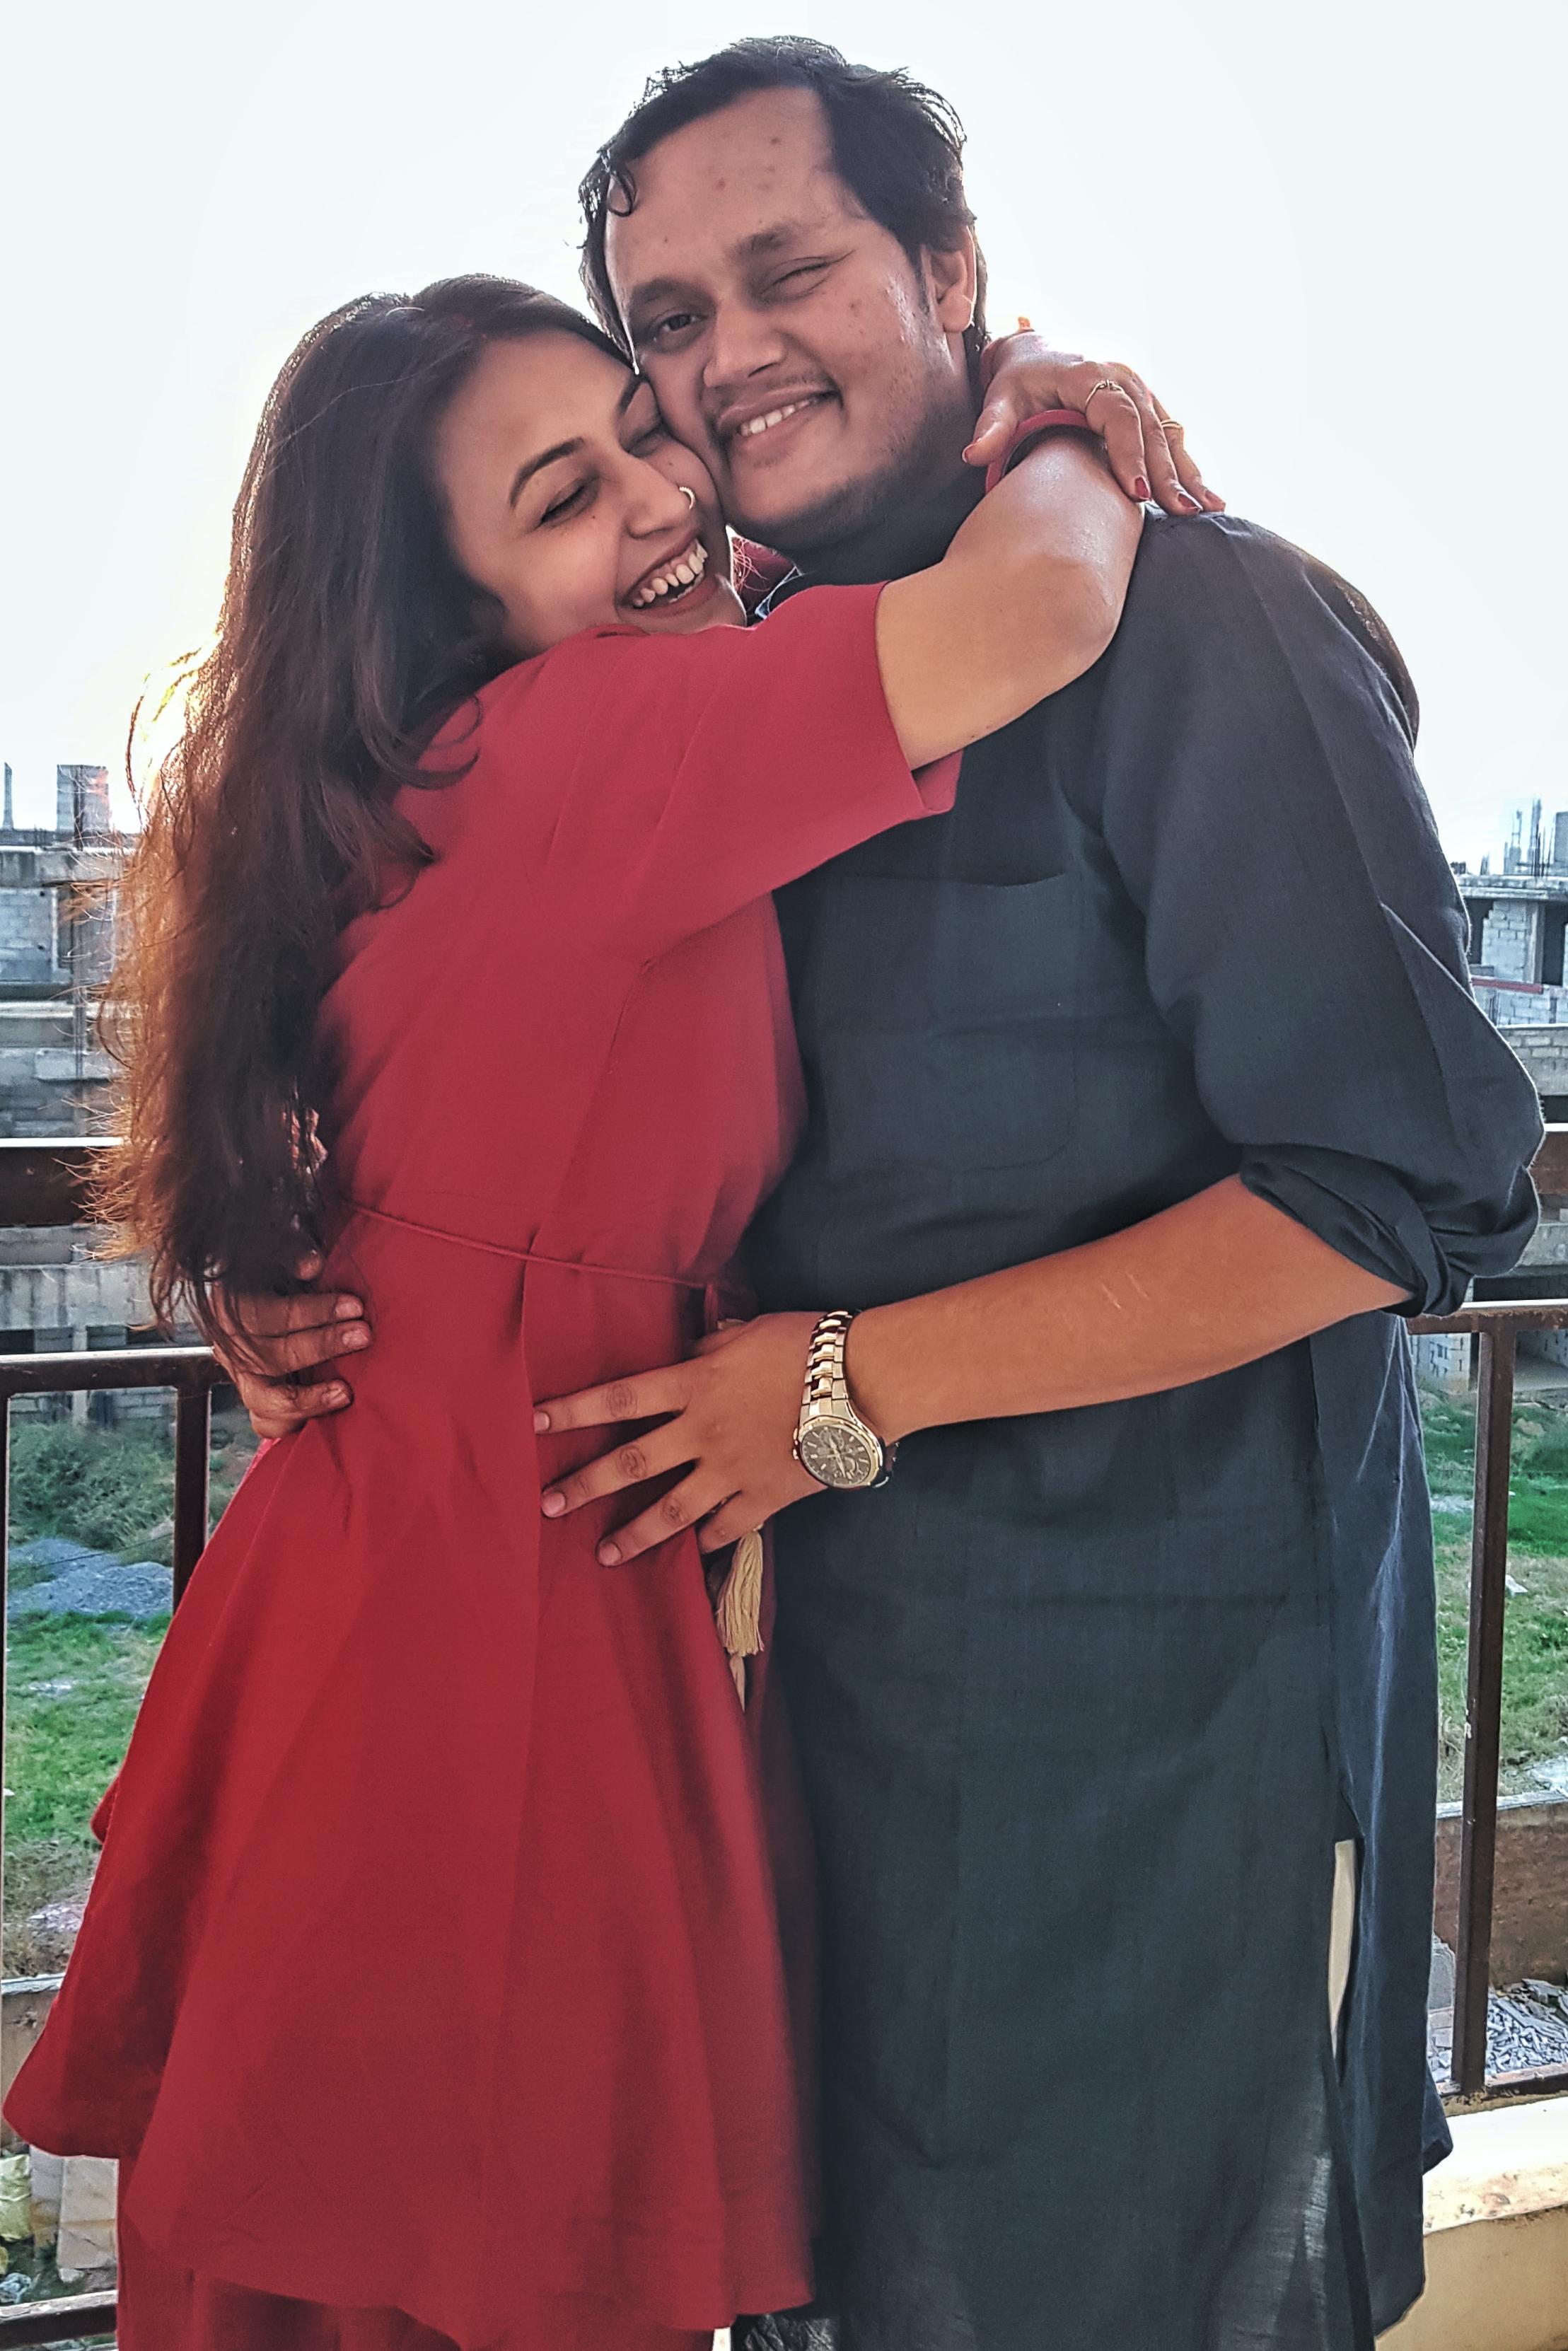 Gratis indisk kjærlighet dating ex GF dating en annen fyr